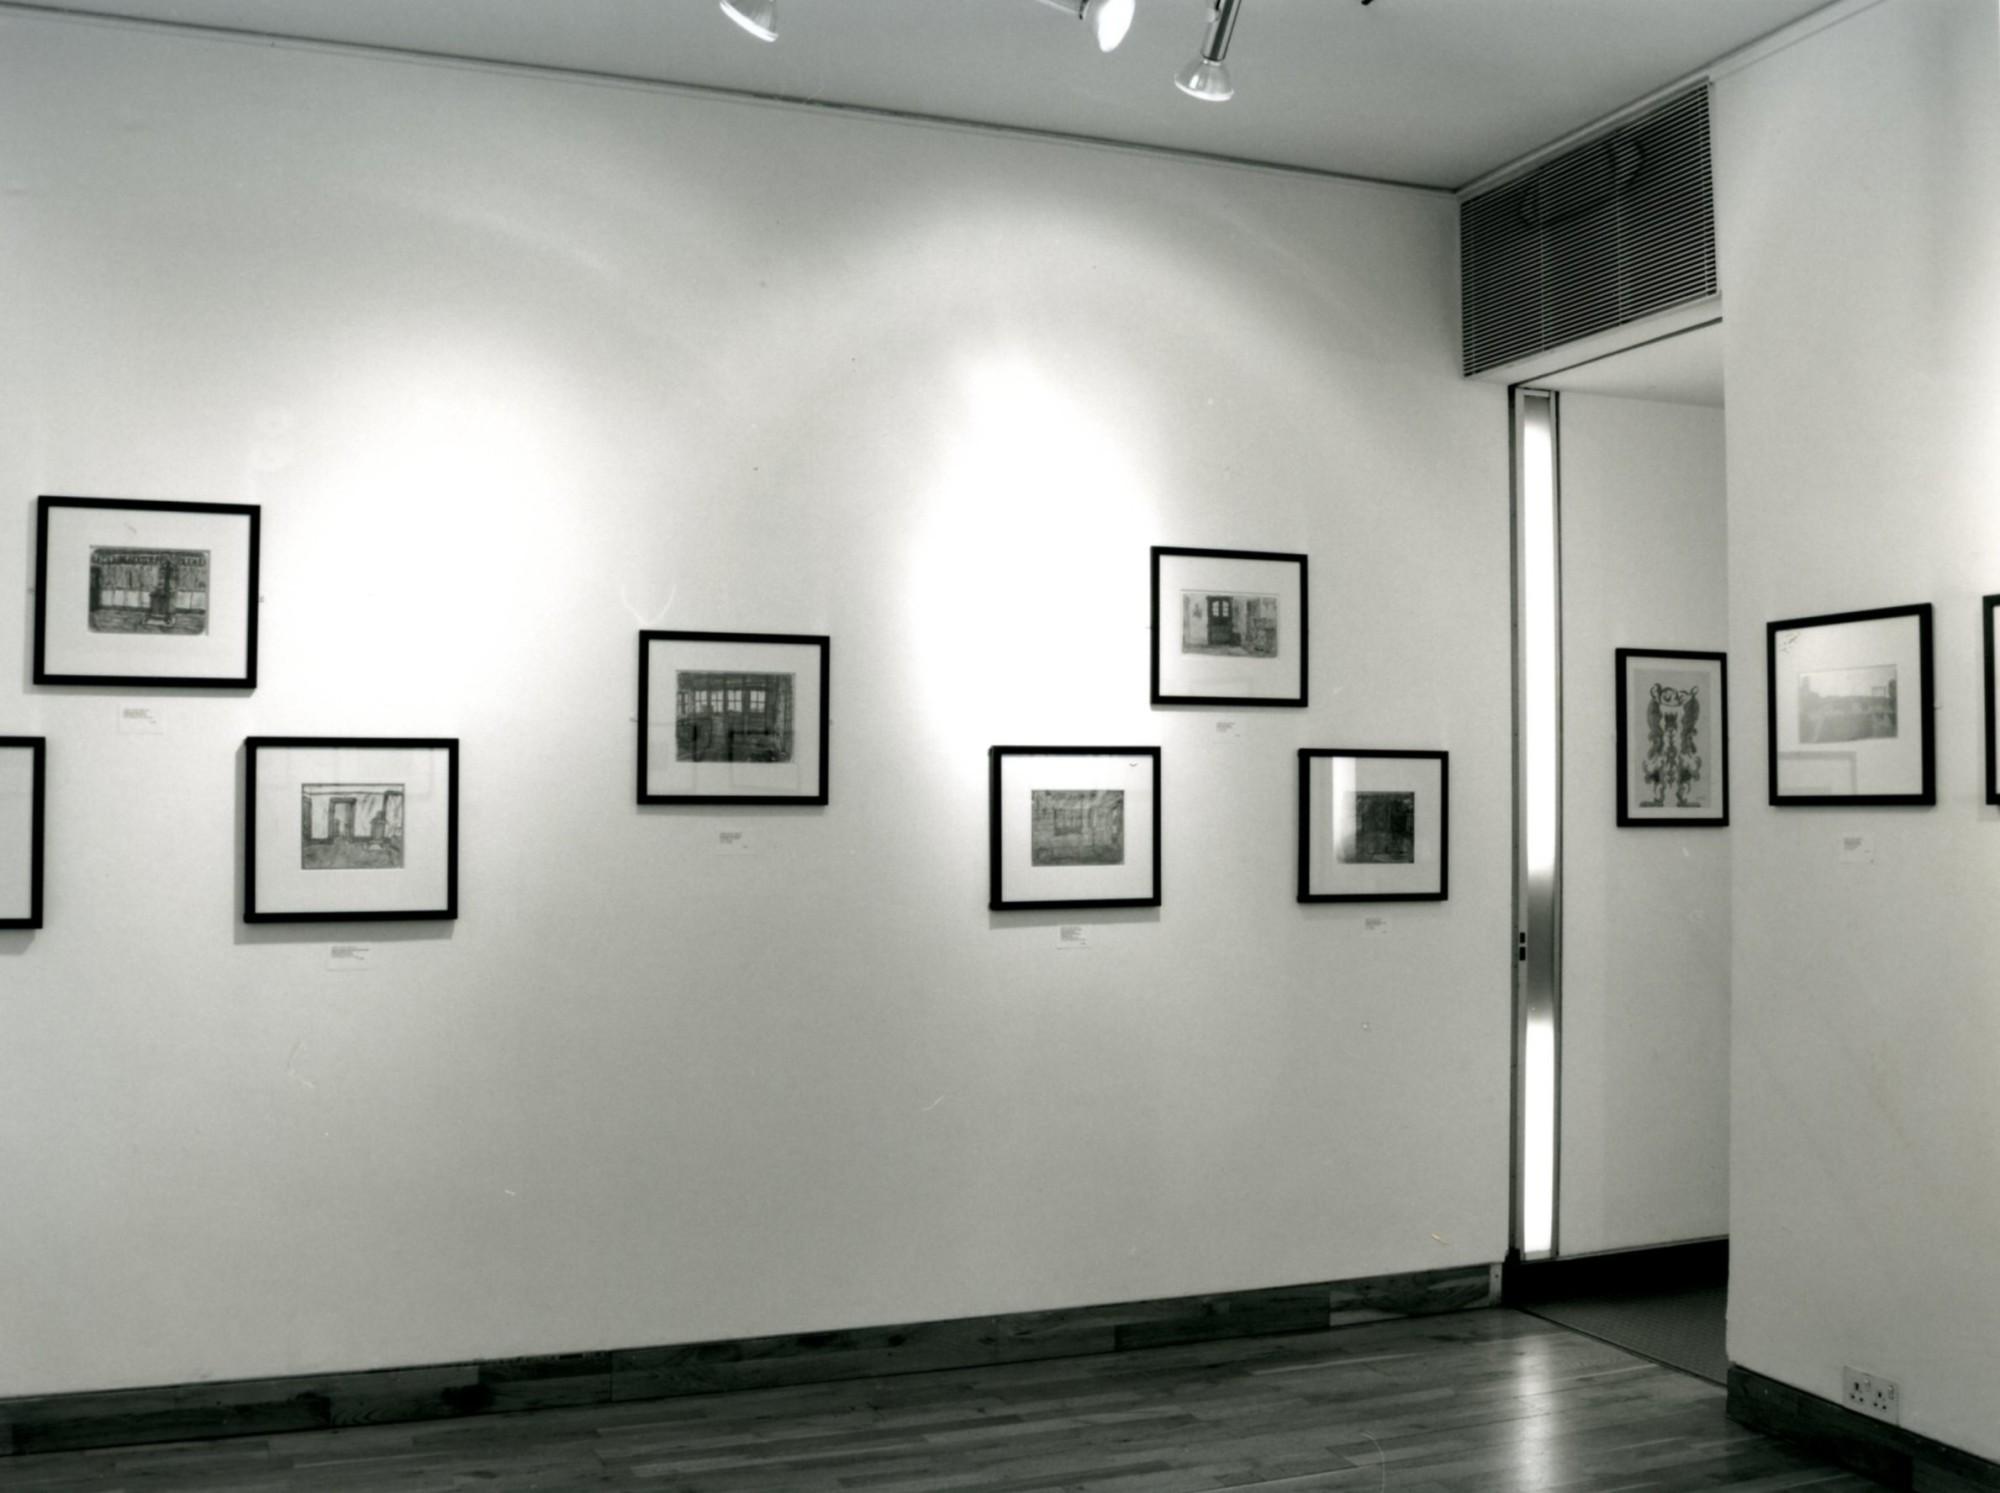 "<span class=""link fancybox-details-link""><a href=""/exhibitions/144/works/image_standalone592/"">View Detail Page</a></span><p>JAMES CASTLE | 1900 - 1977 | 27 NOV - 20 DEC 2001 | Installation View</p>"